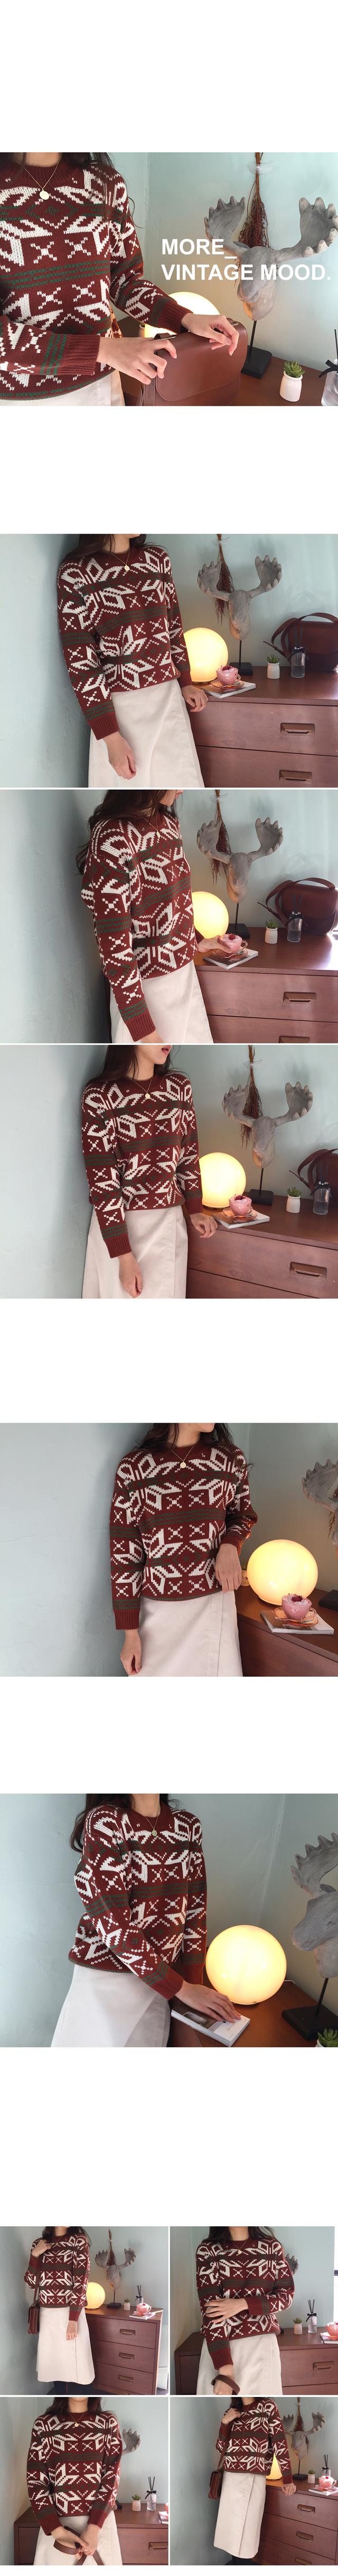 Rudolph-vintage knit